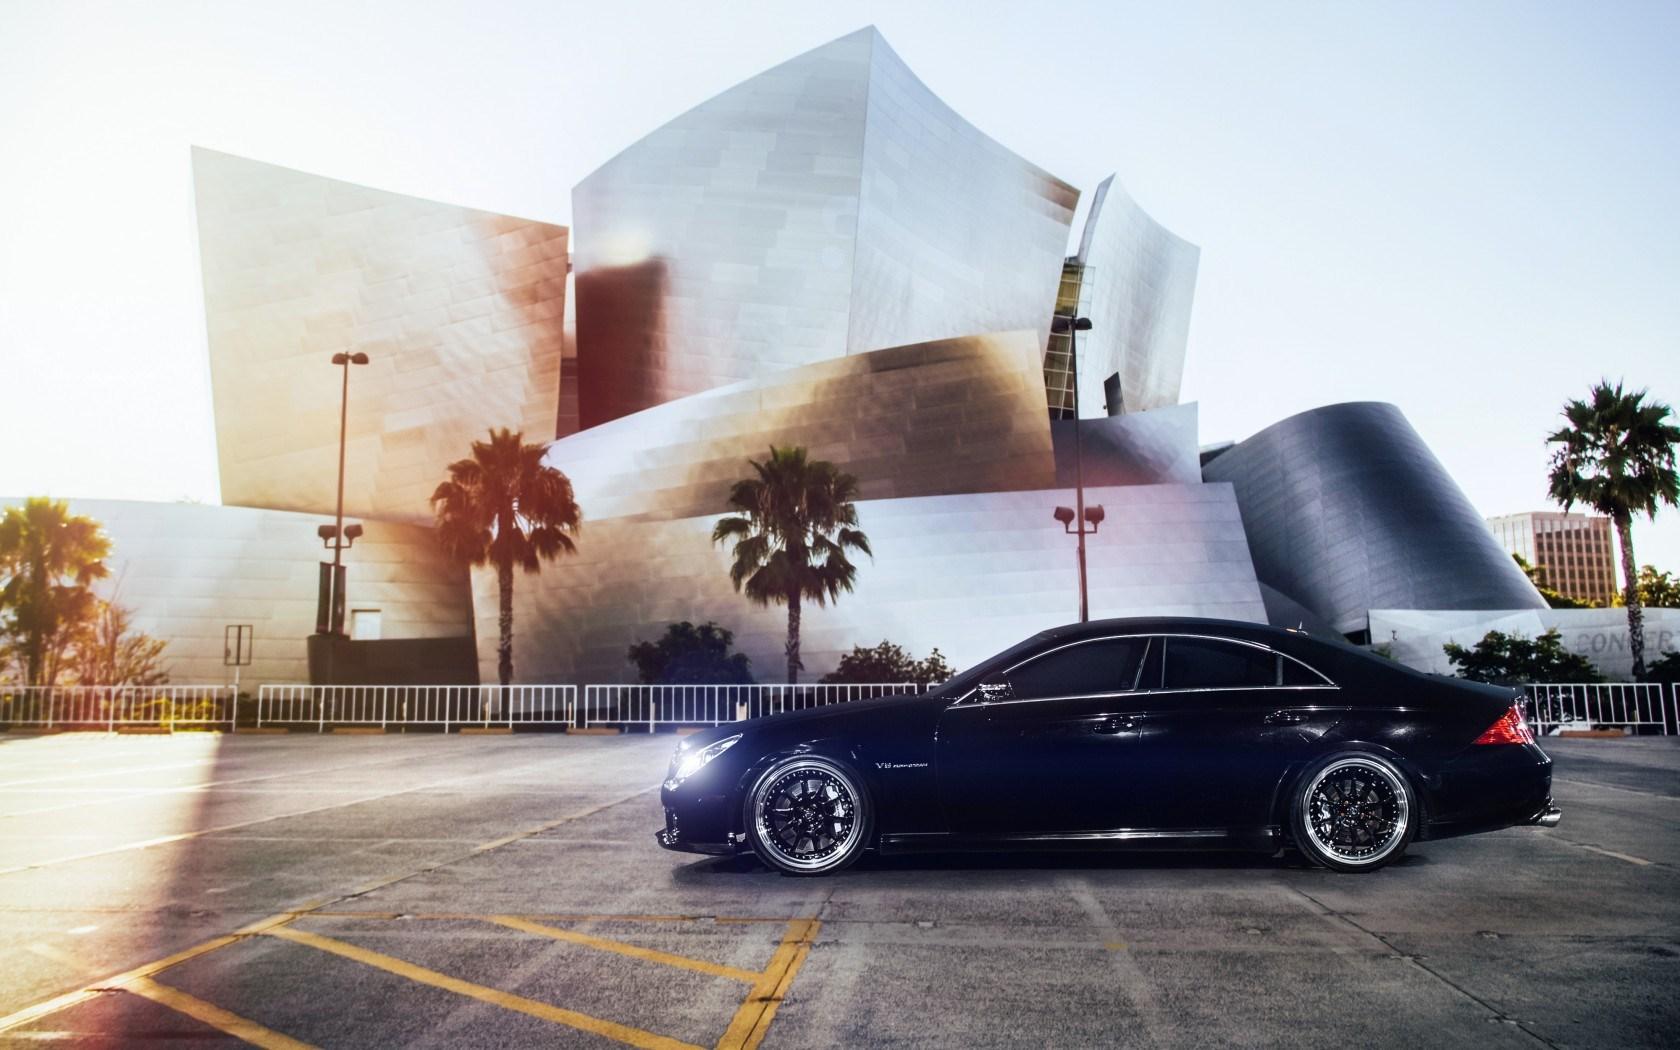 Mercedes-Benz CLS 55 AMG Tuning Car